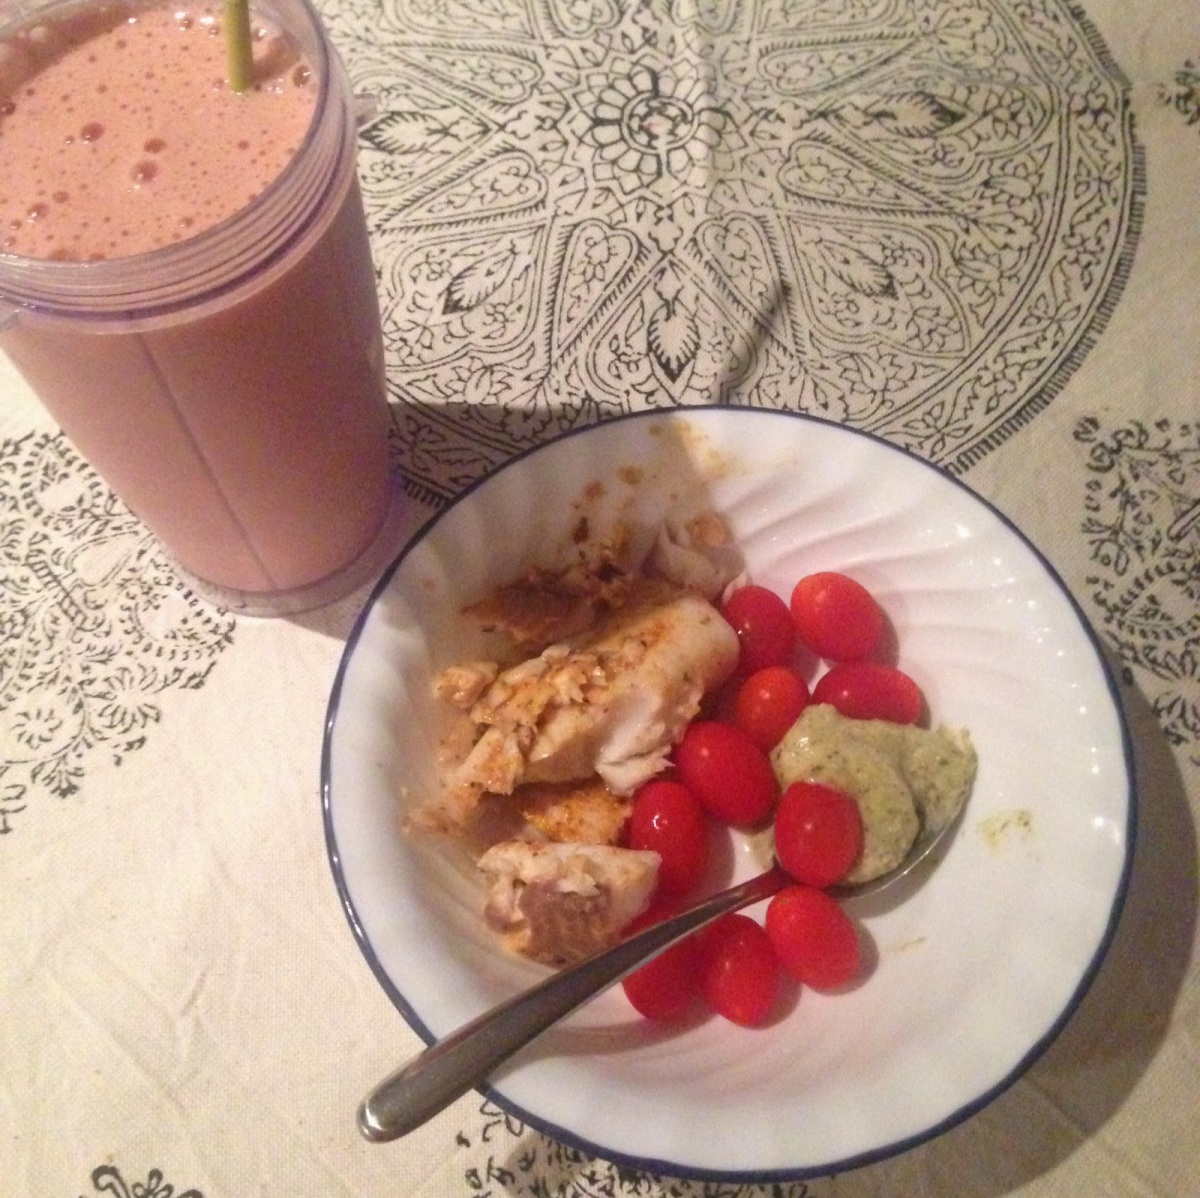 Dinner: 4 oz Tilapia with cherry tomatos, 1 tbsp hummus and a protein shake